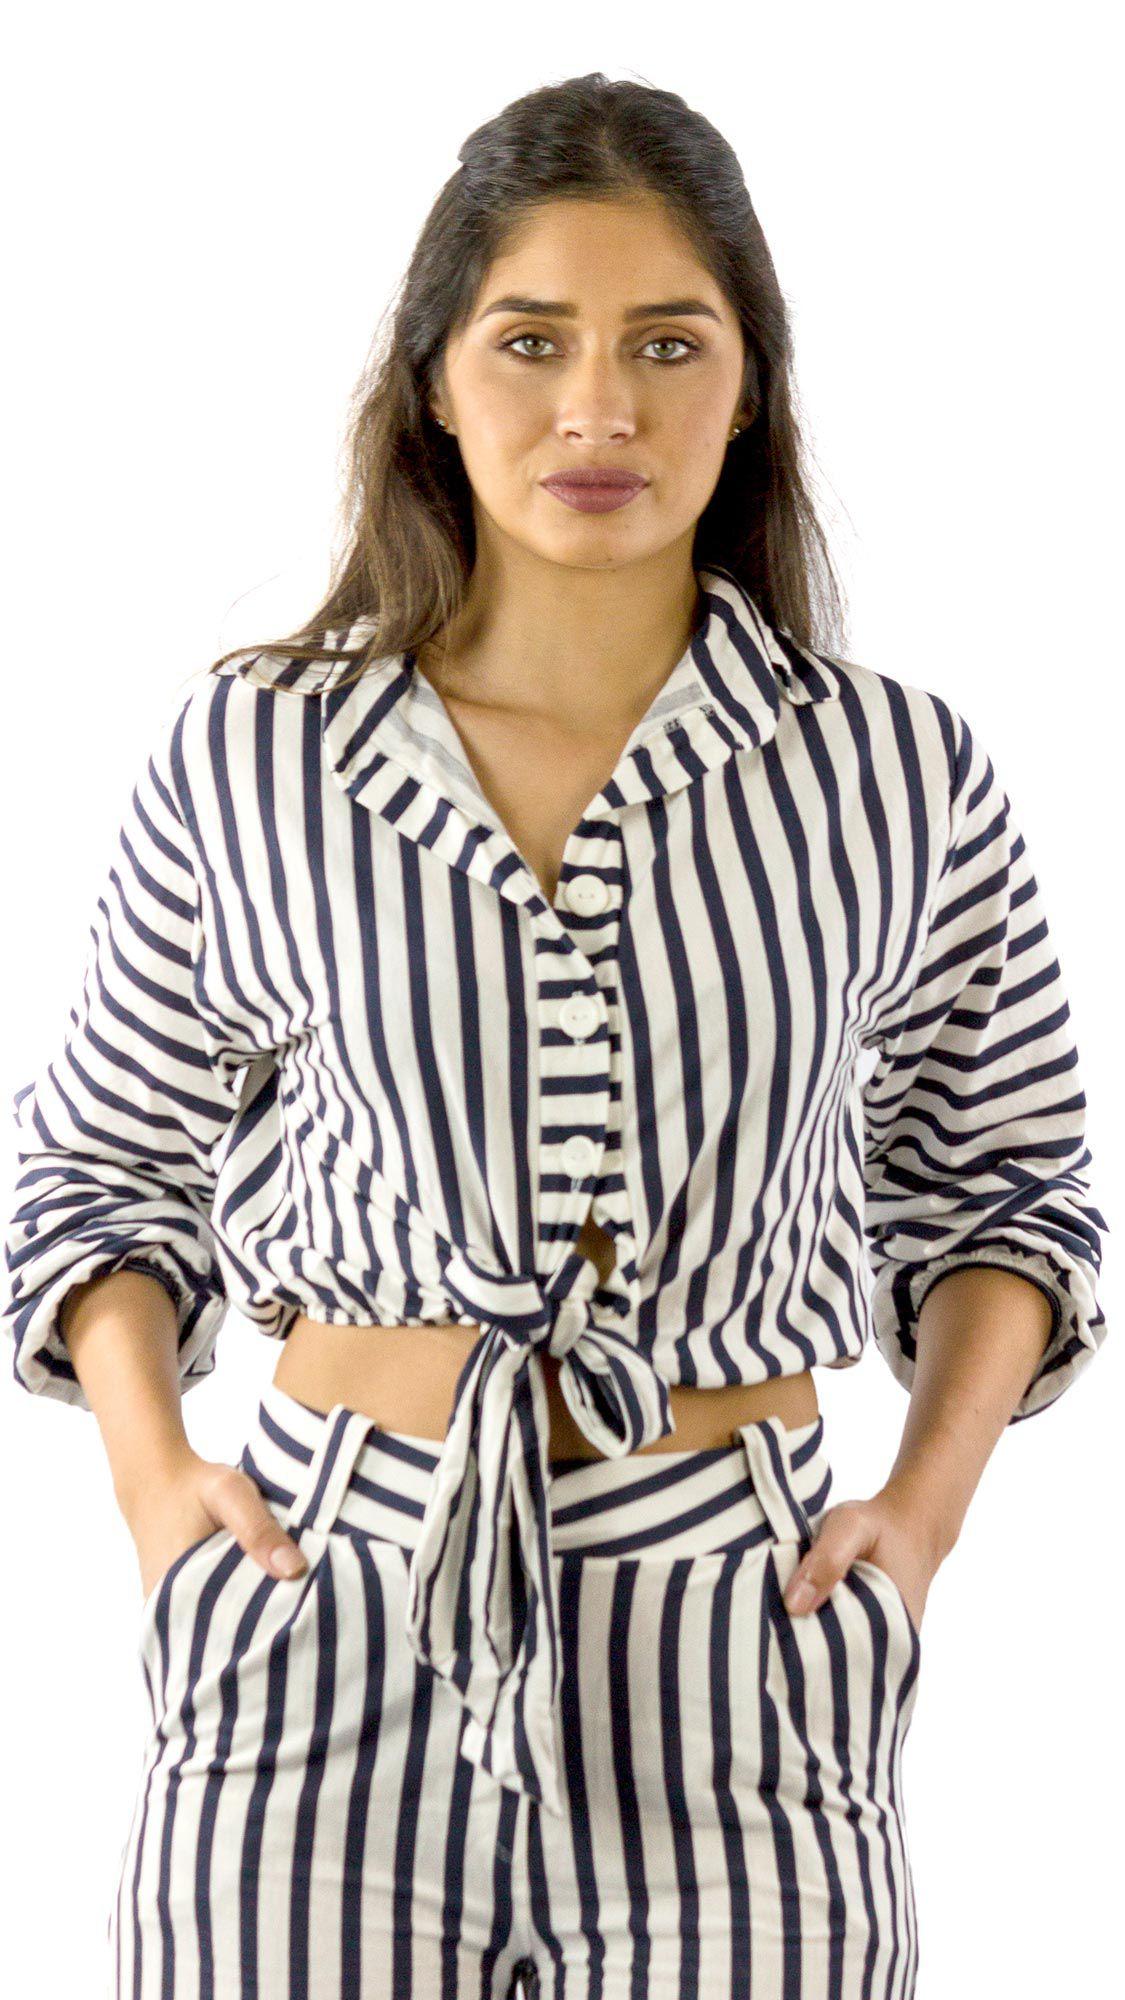 478761b6d NotoriaStore: Moda Feminina Florianópolis - Online Cropped marinheiro